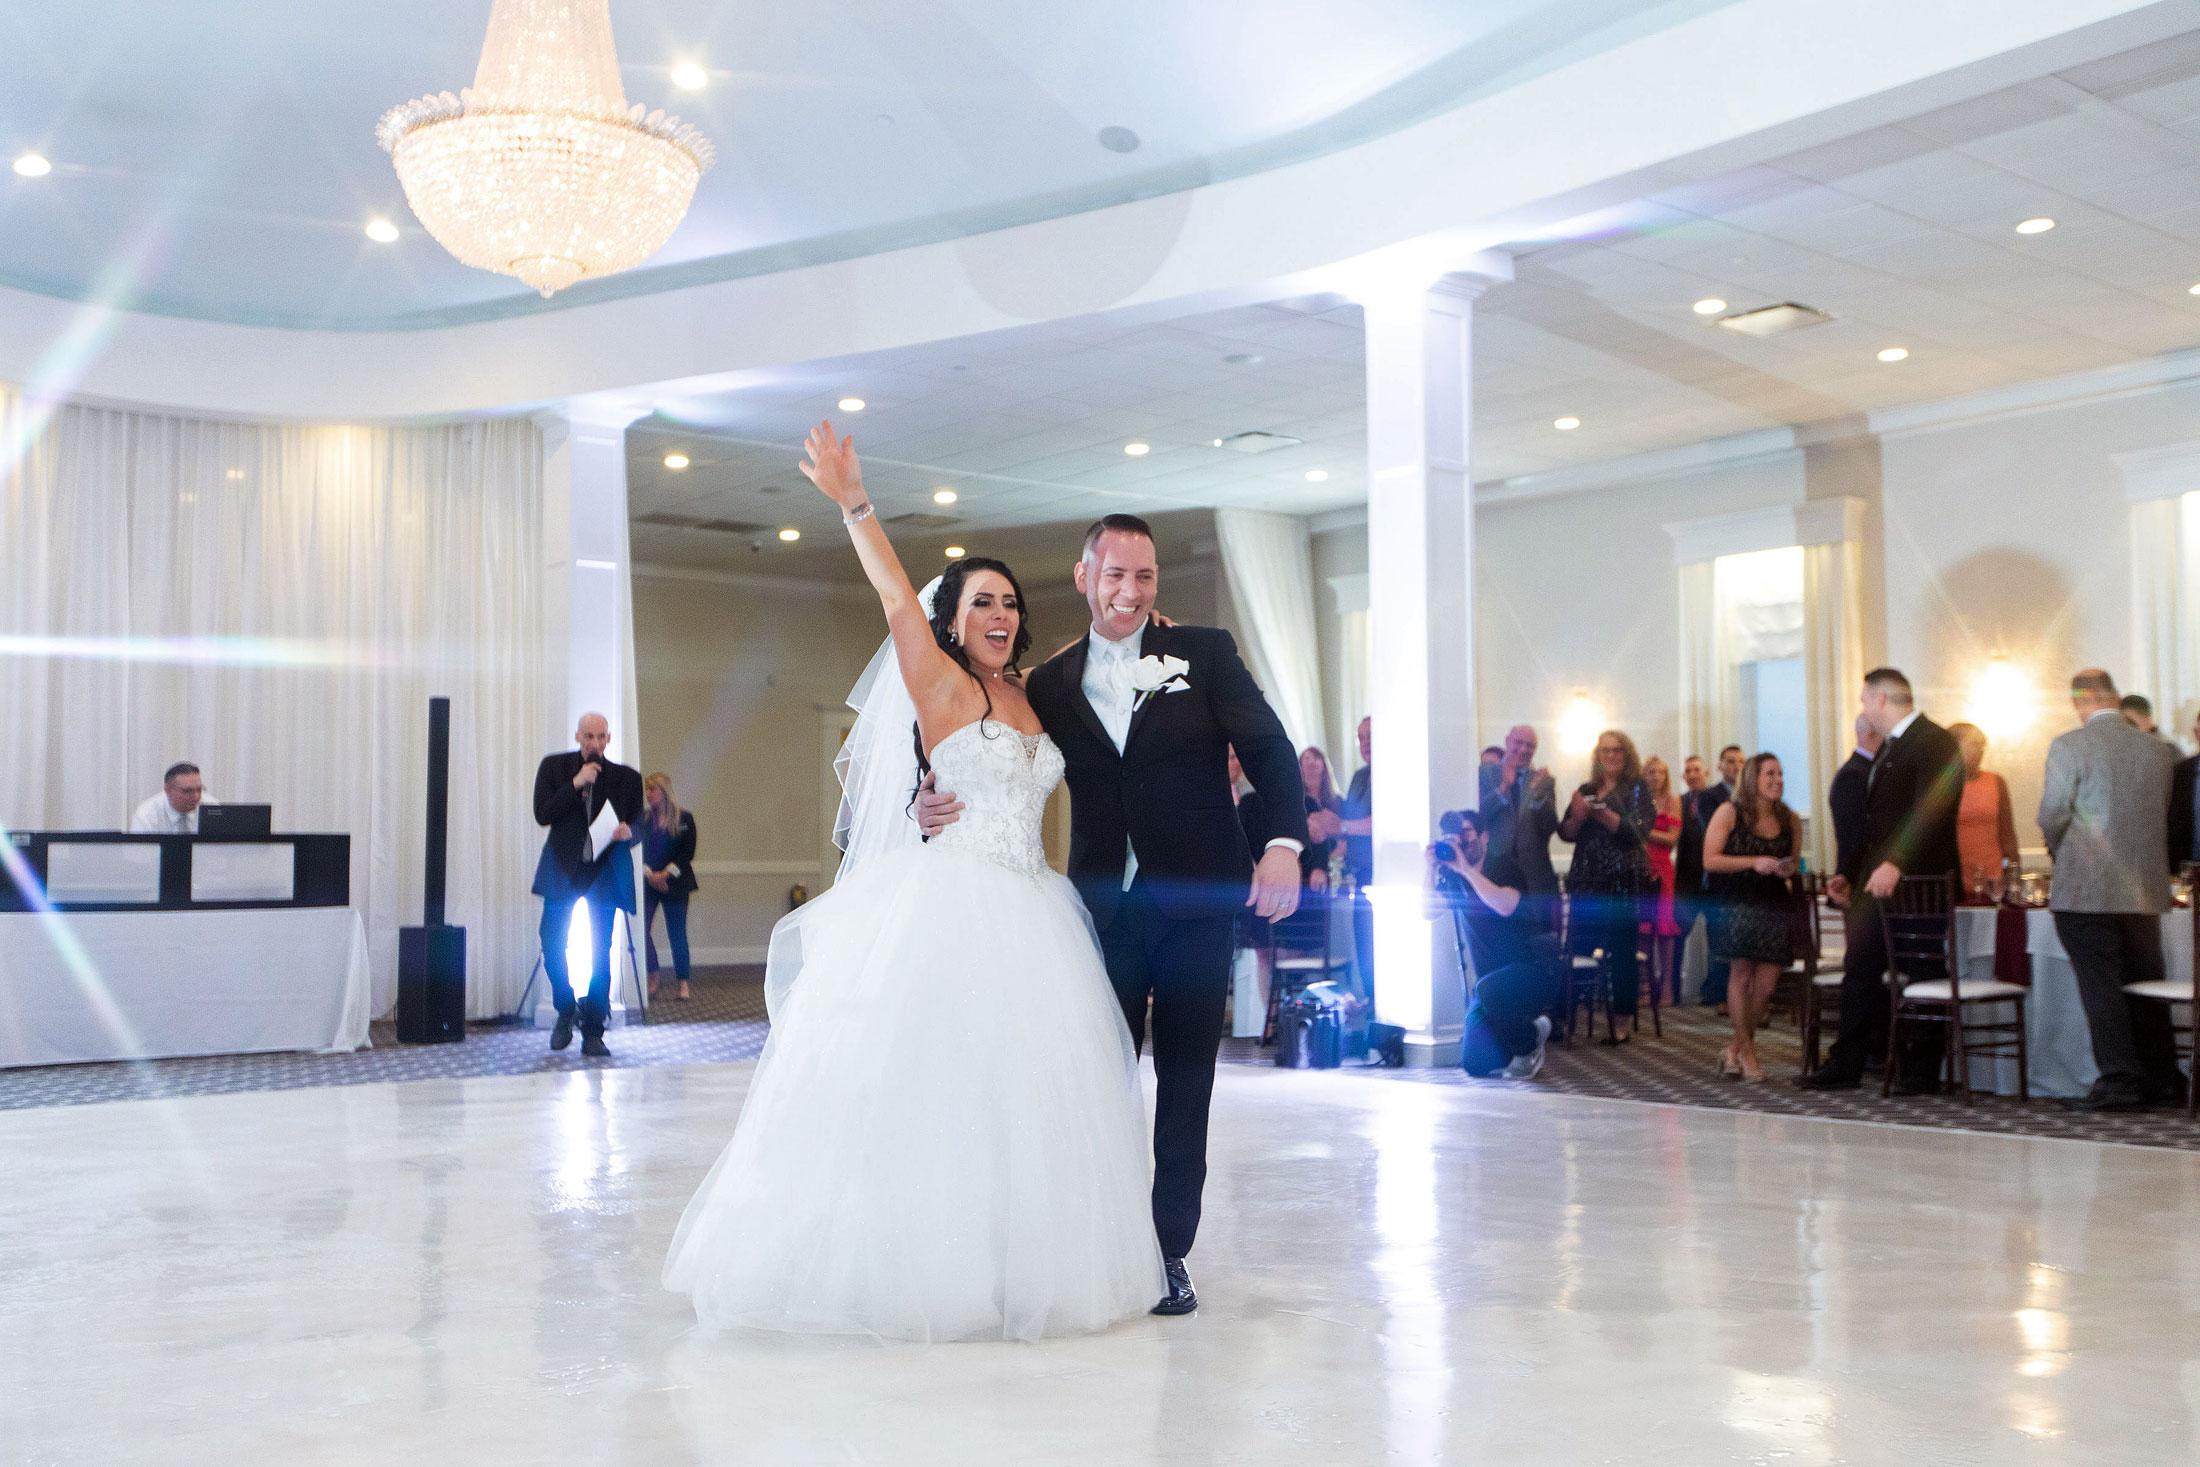 Ballroom wedding reception at Avenir Walpole